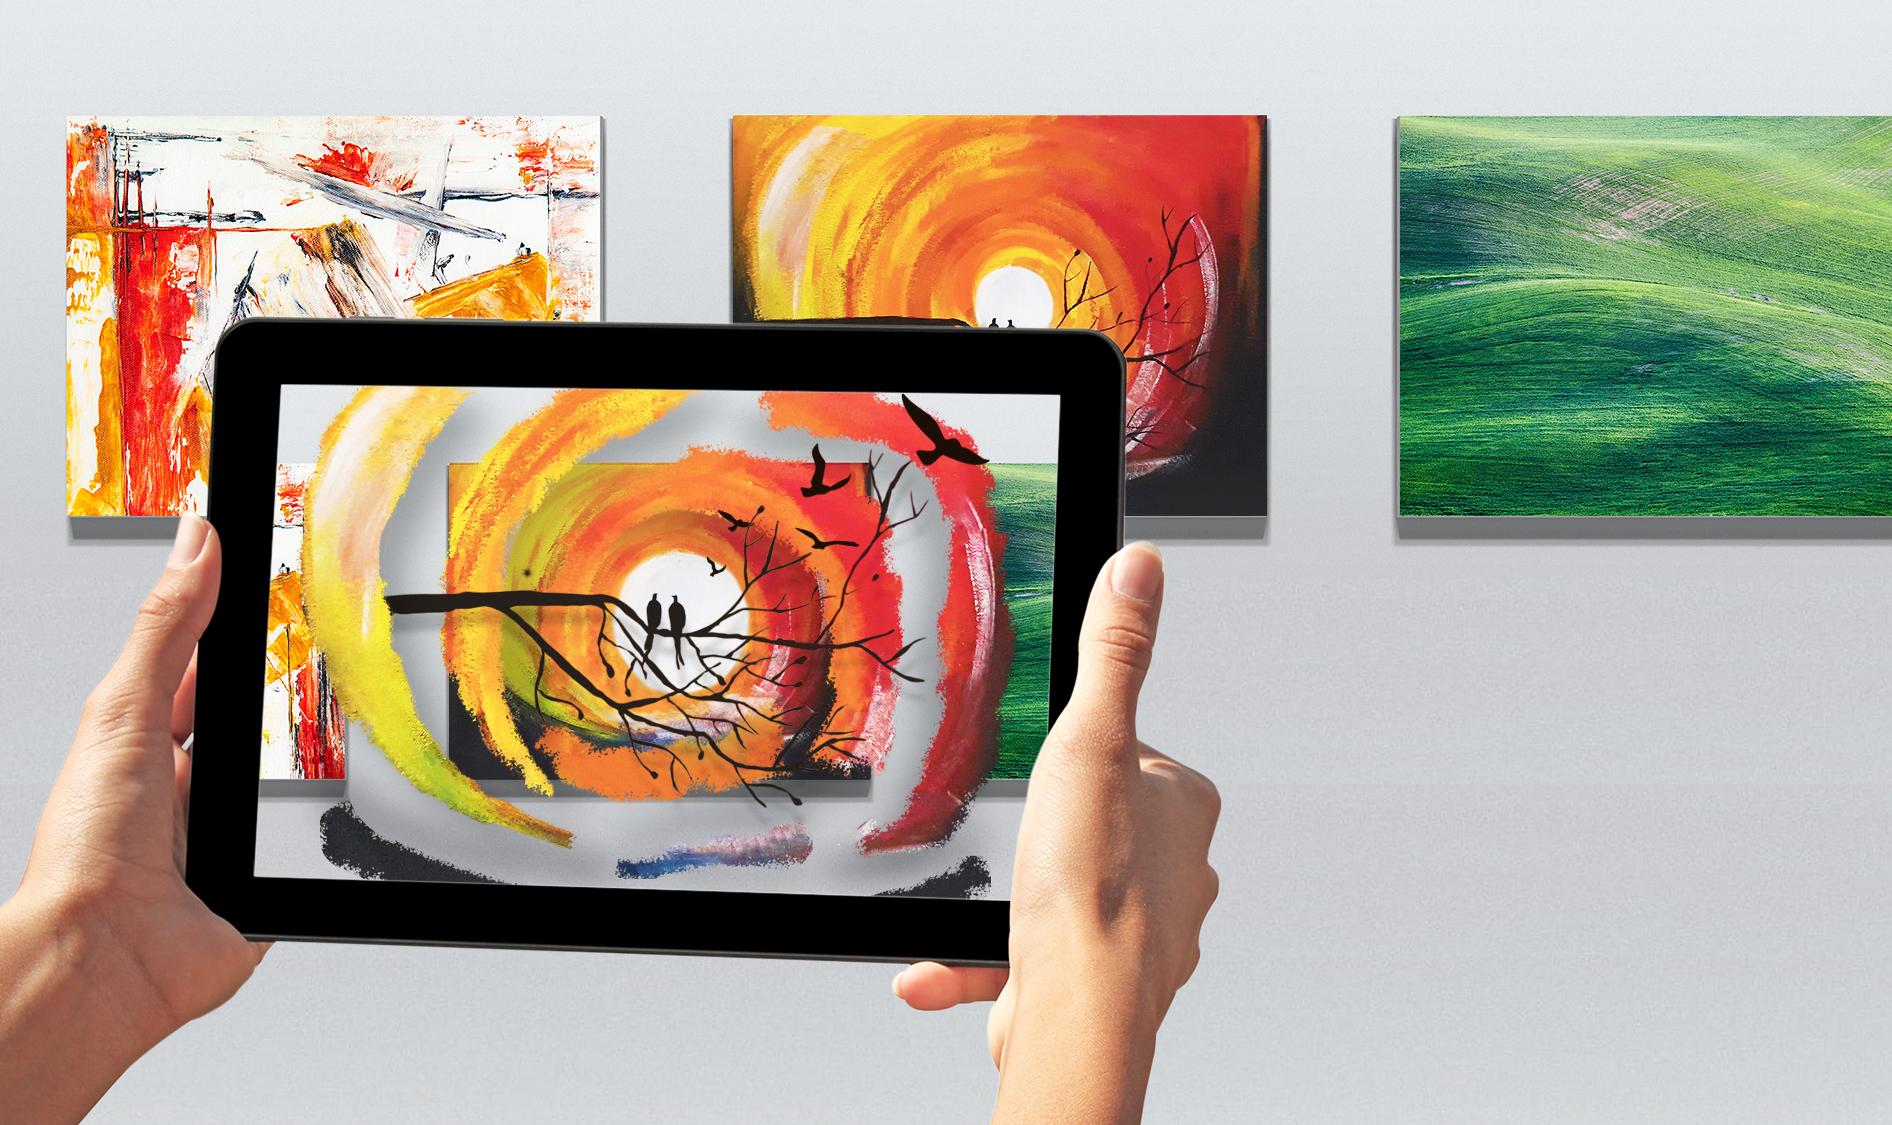 Augmented Reality for Art | Augmented Reality for Art Galleries